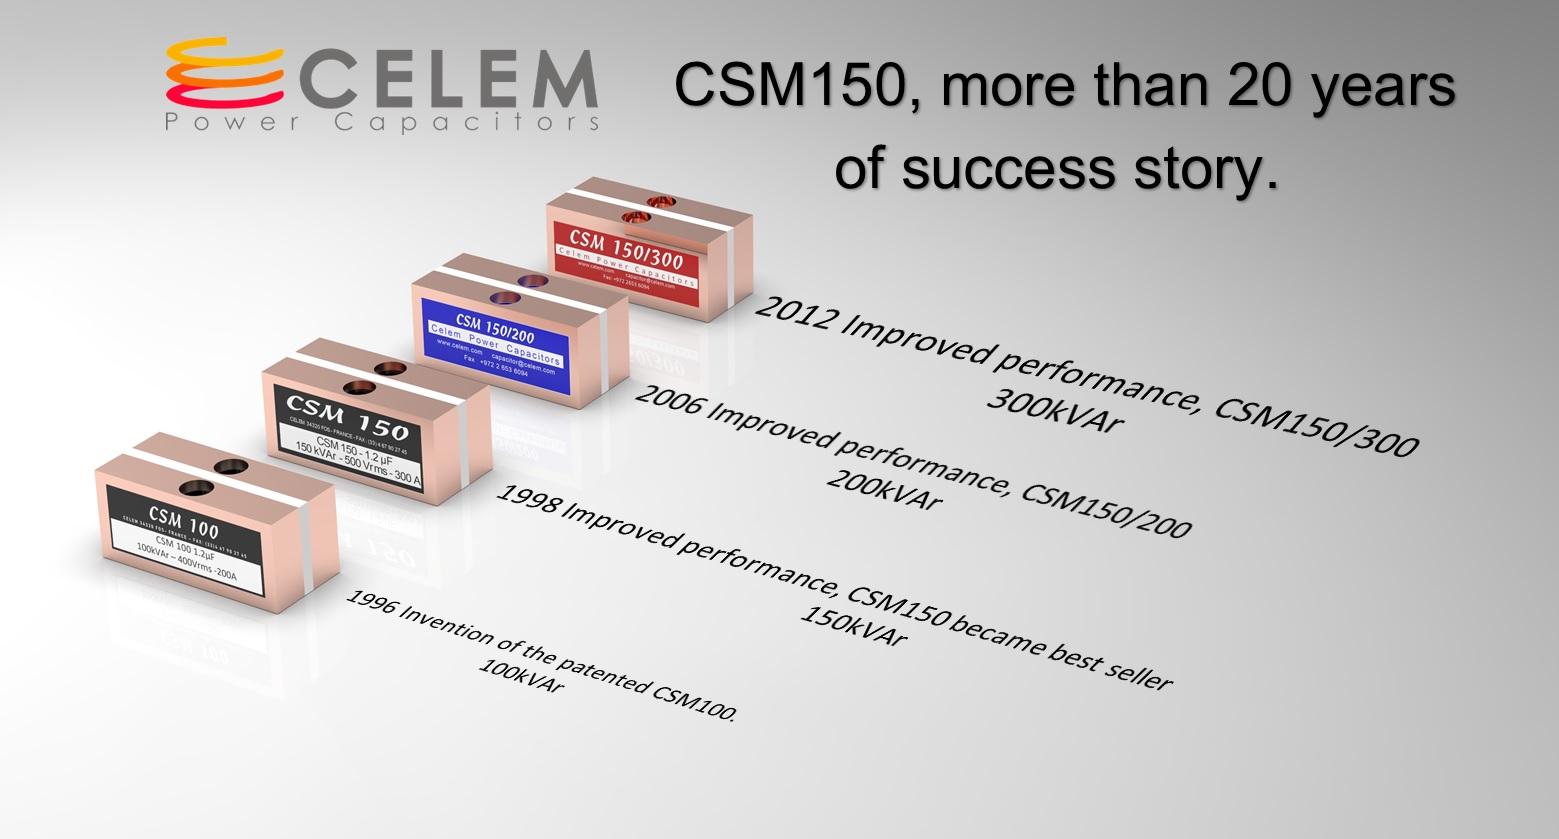 CSM150 Success story